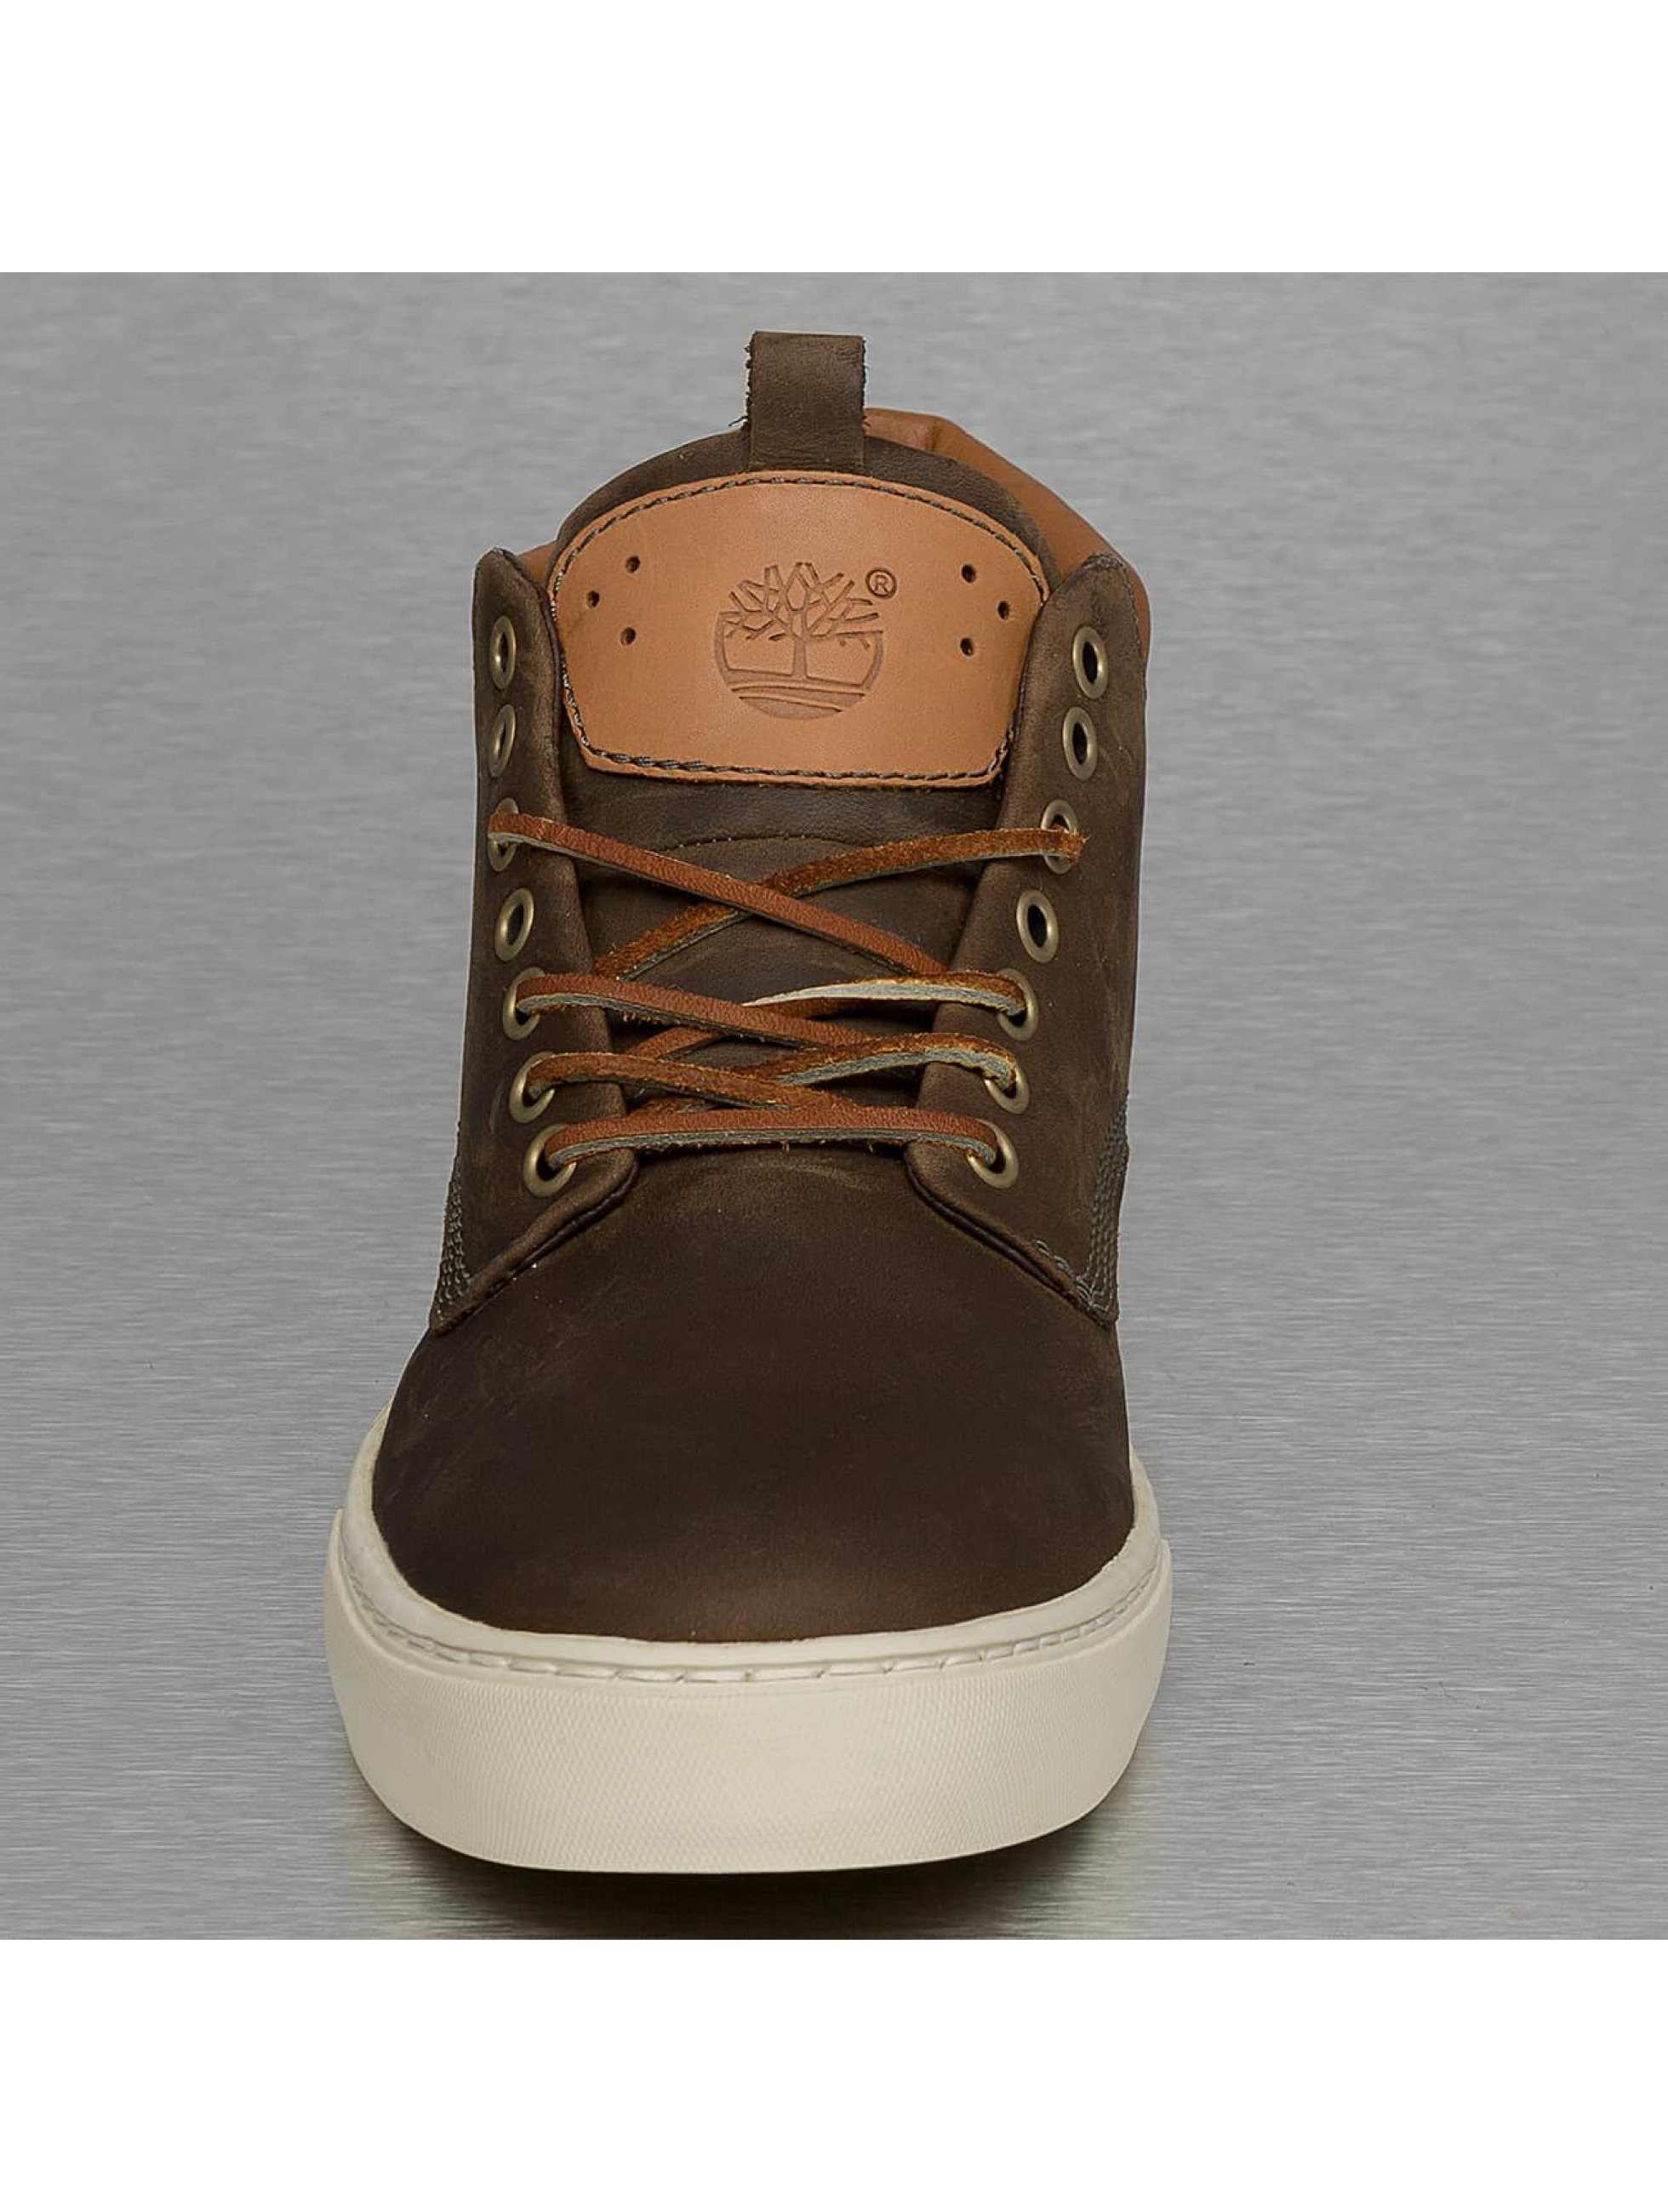 Timberland Sneakers Earthkeepers Adventure 2.0 Cupsole Chukka brown